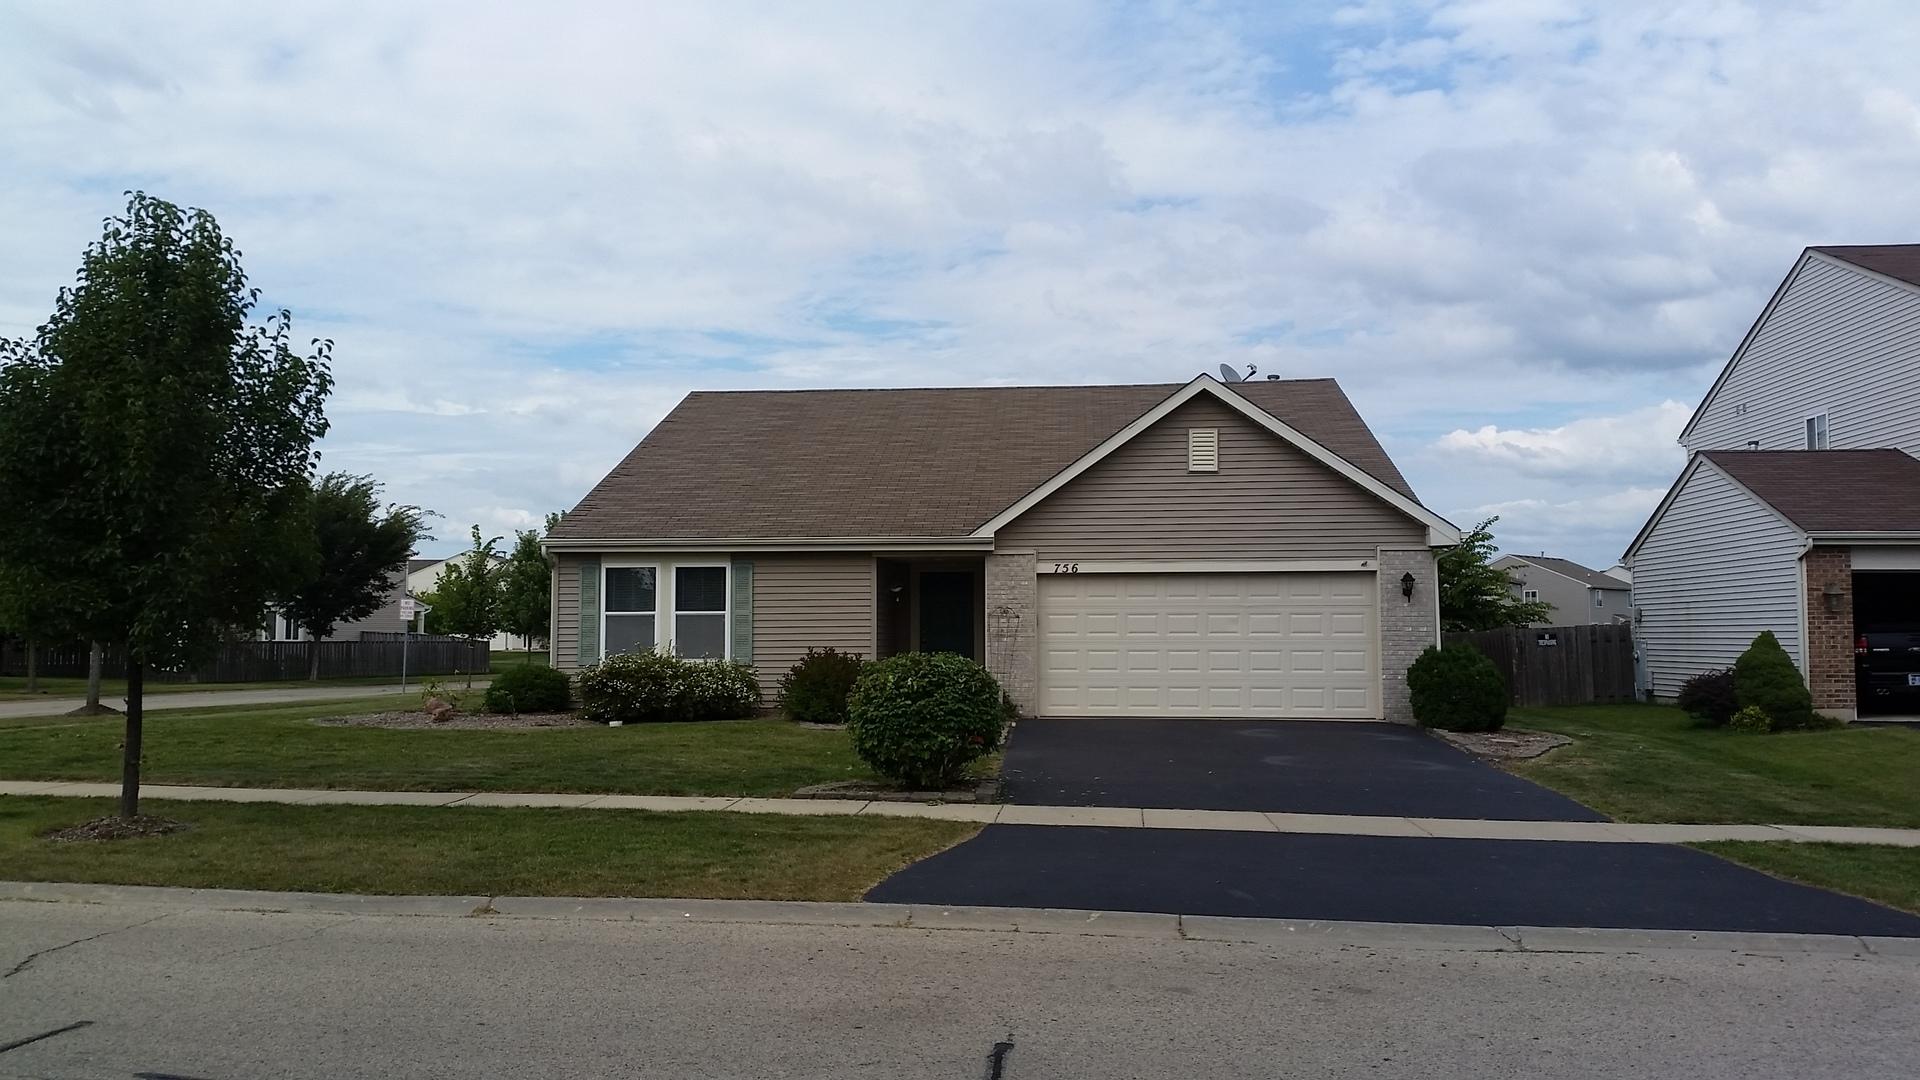 Illinois kane county carpentersville - 756 Glen Cove Lane Pingree Grove Kane County Il 60140